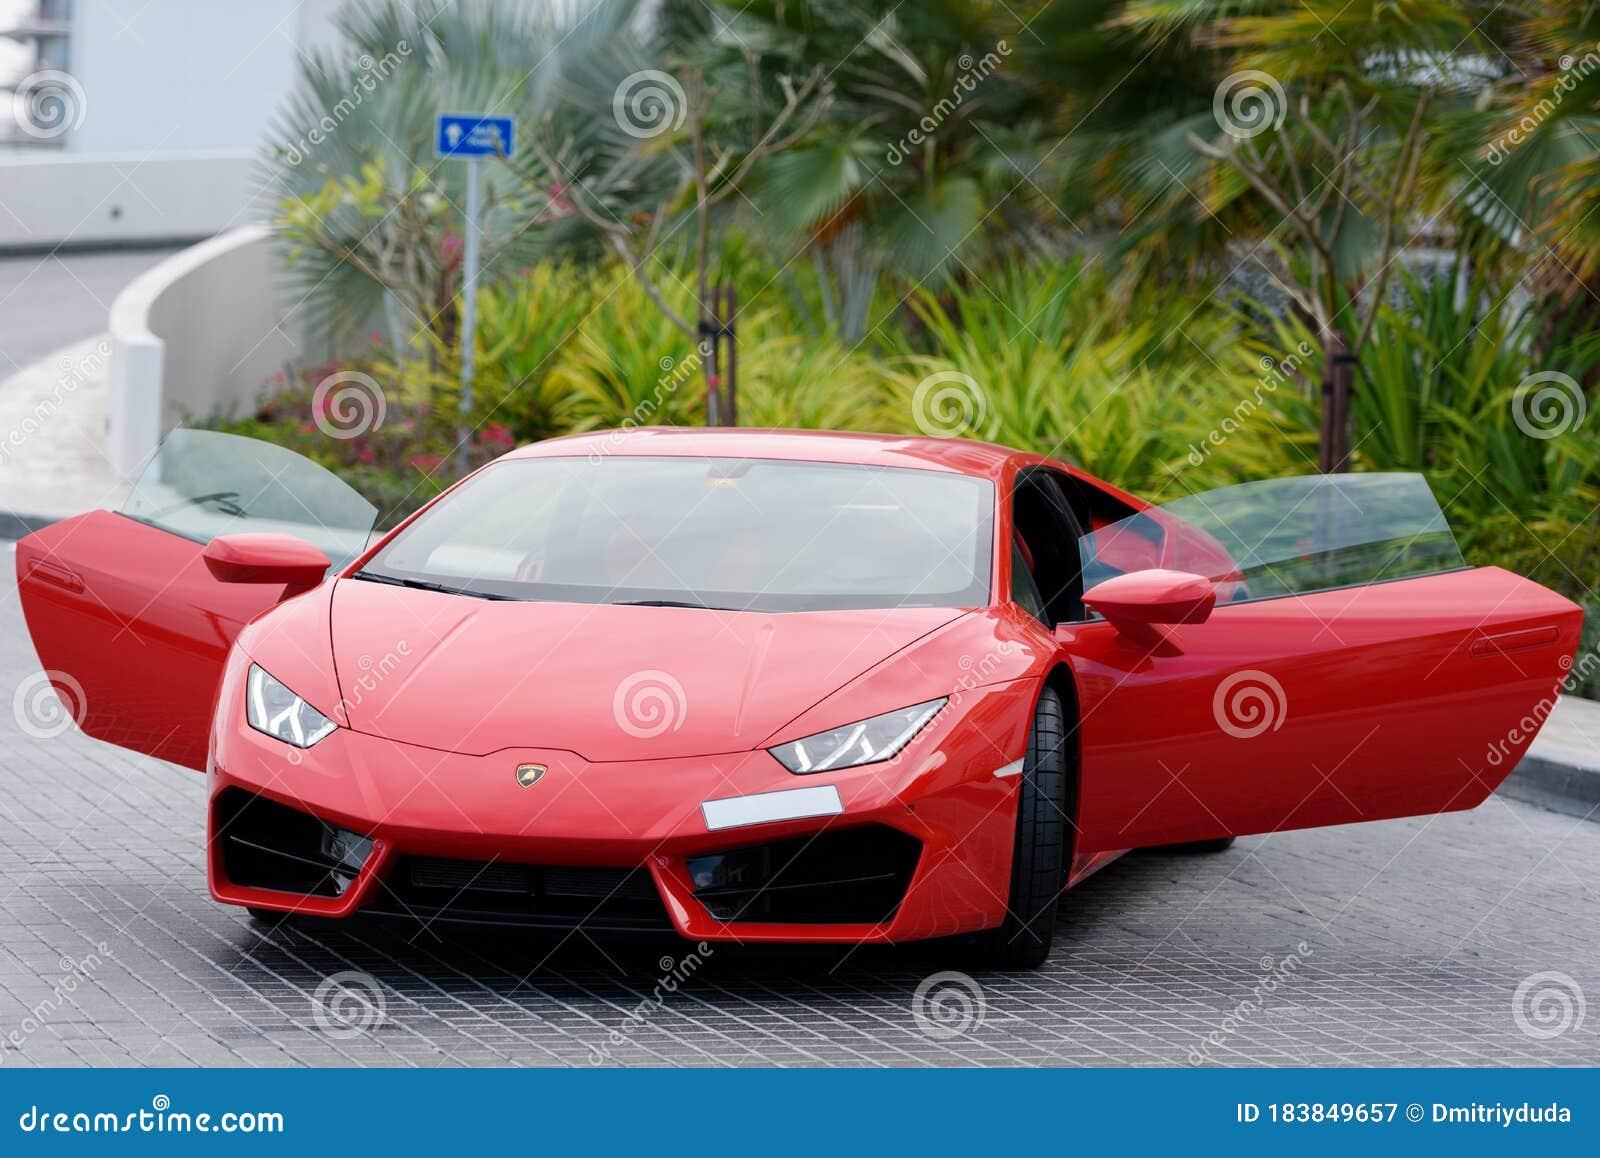 Dubai Uae January 13 2017 Red Luxury Supercar Lamborghini Aventador Roadster Car On The Road In Dubai Editorial Photography Image Of Dream Reflection 183849657